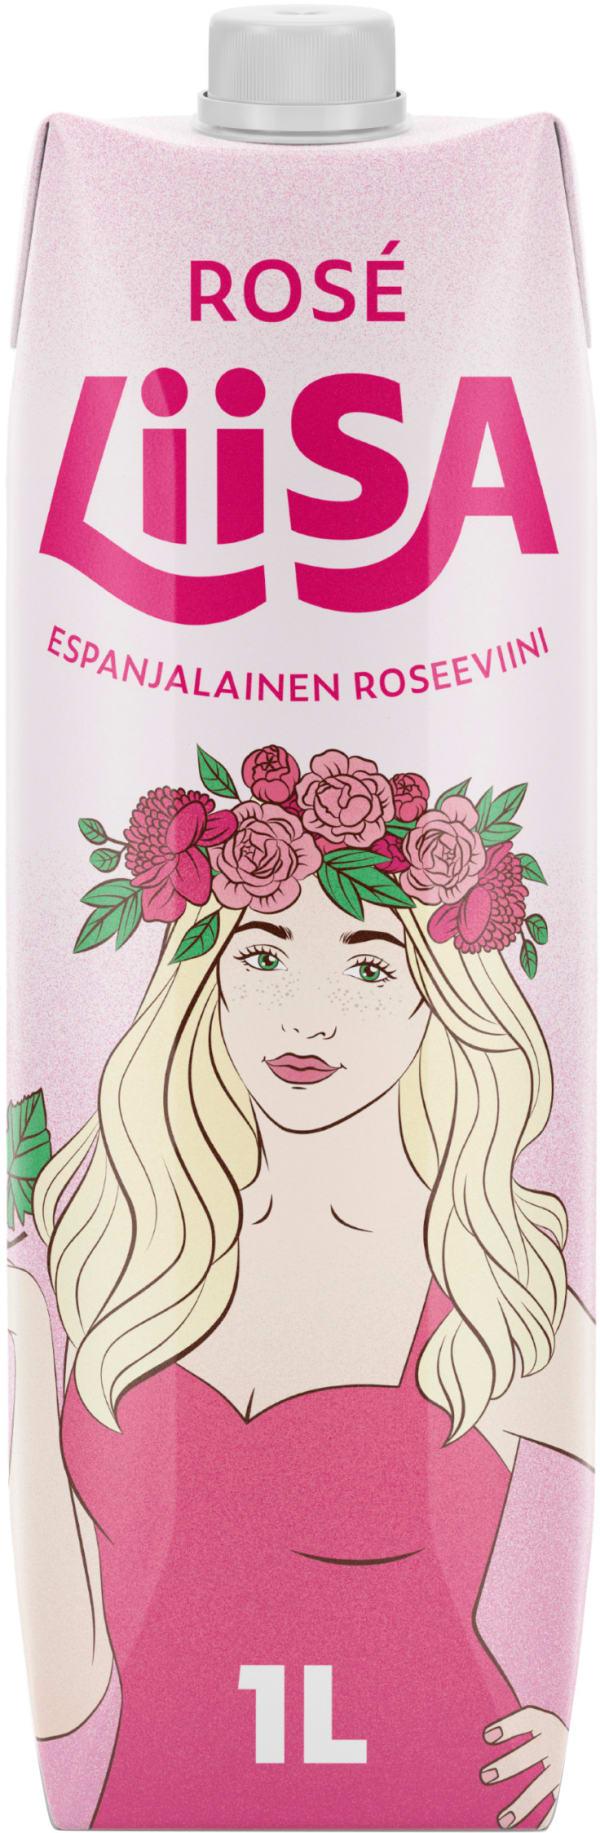 Liisa Bobal Rosé 2020 carton package